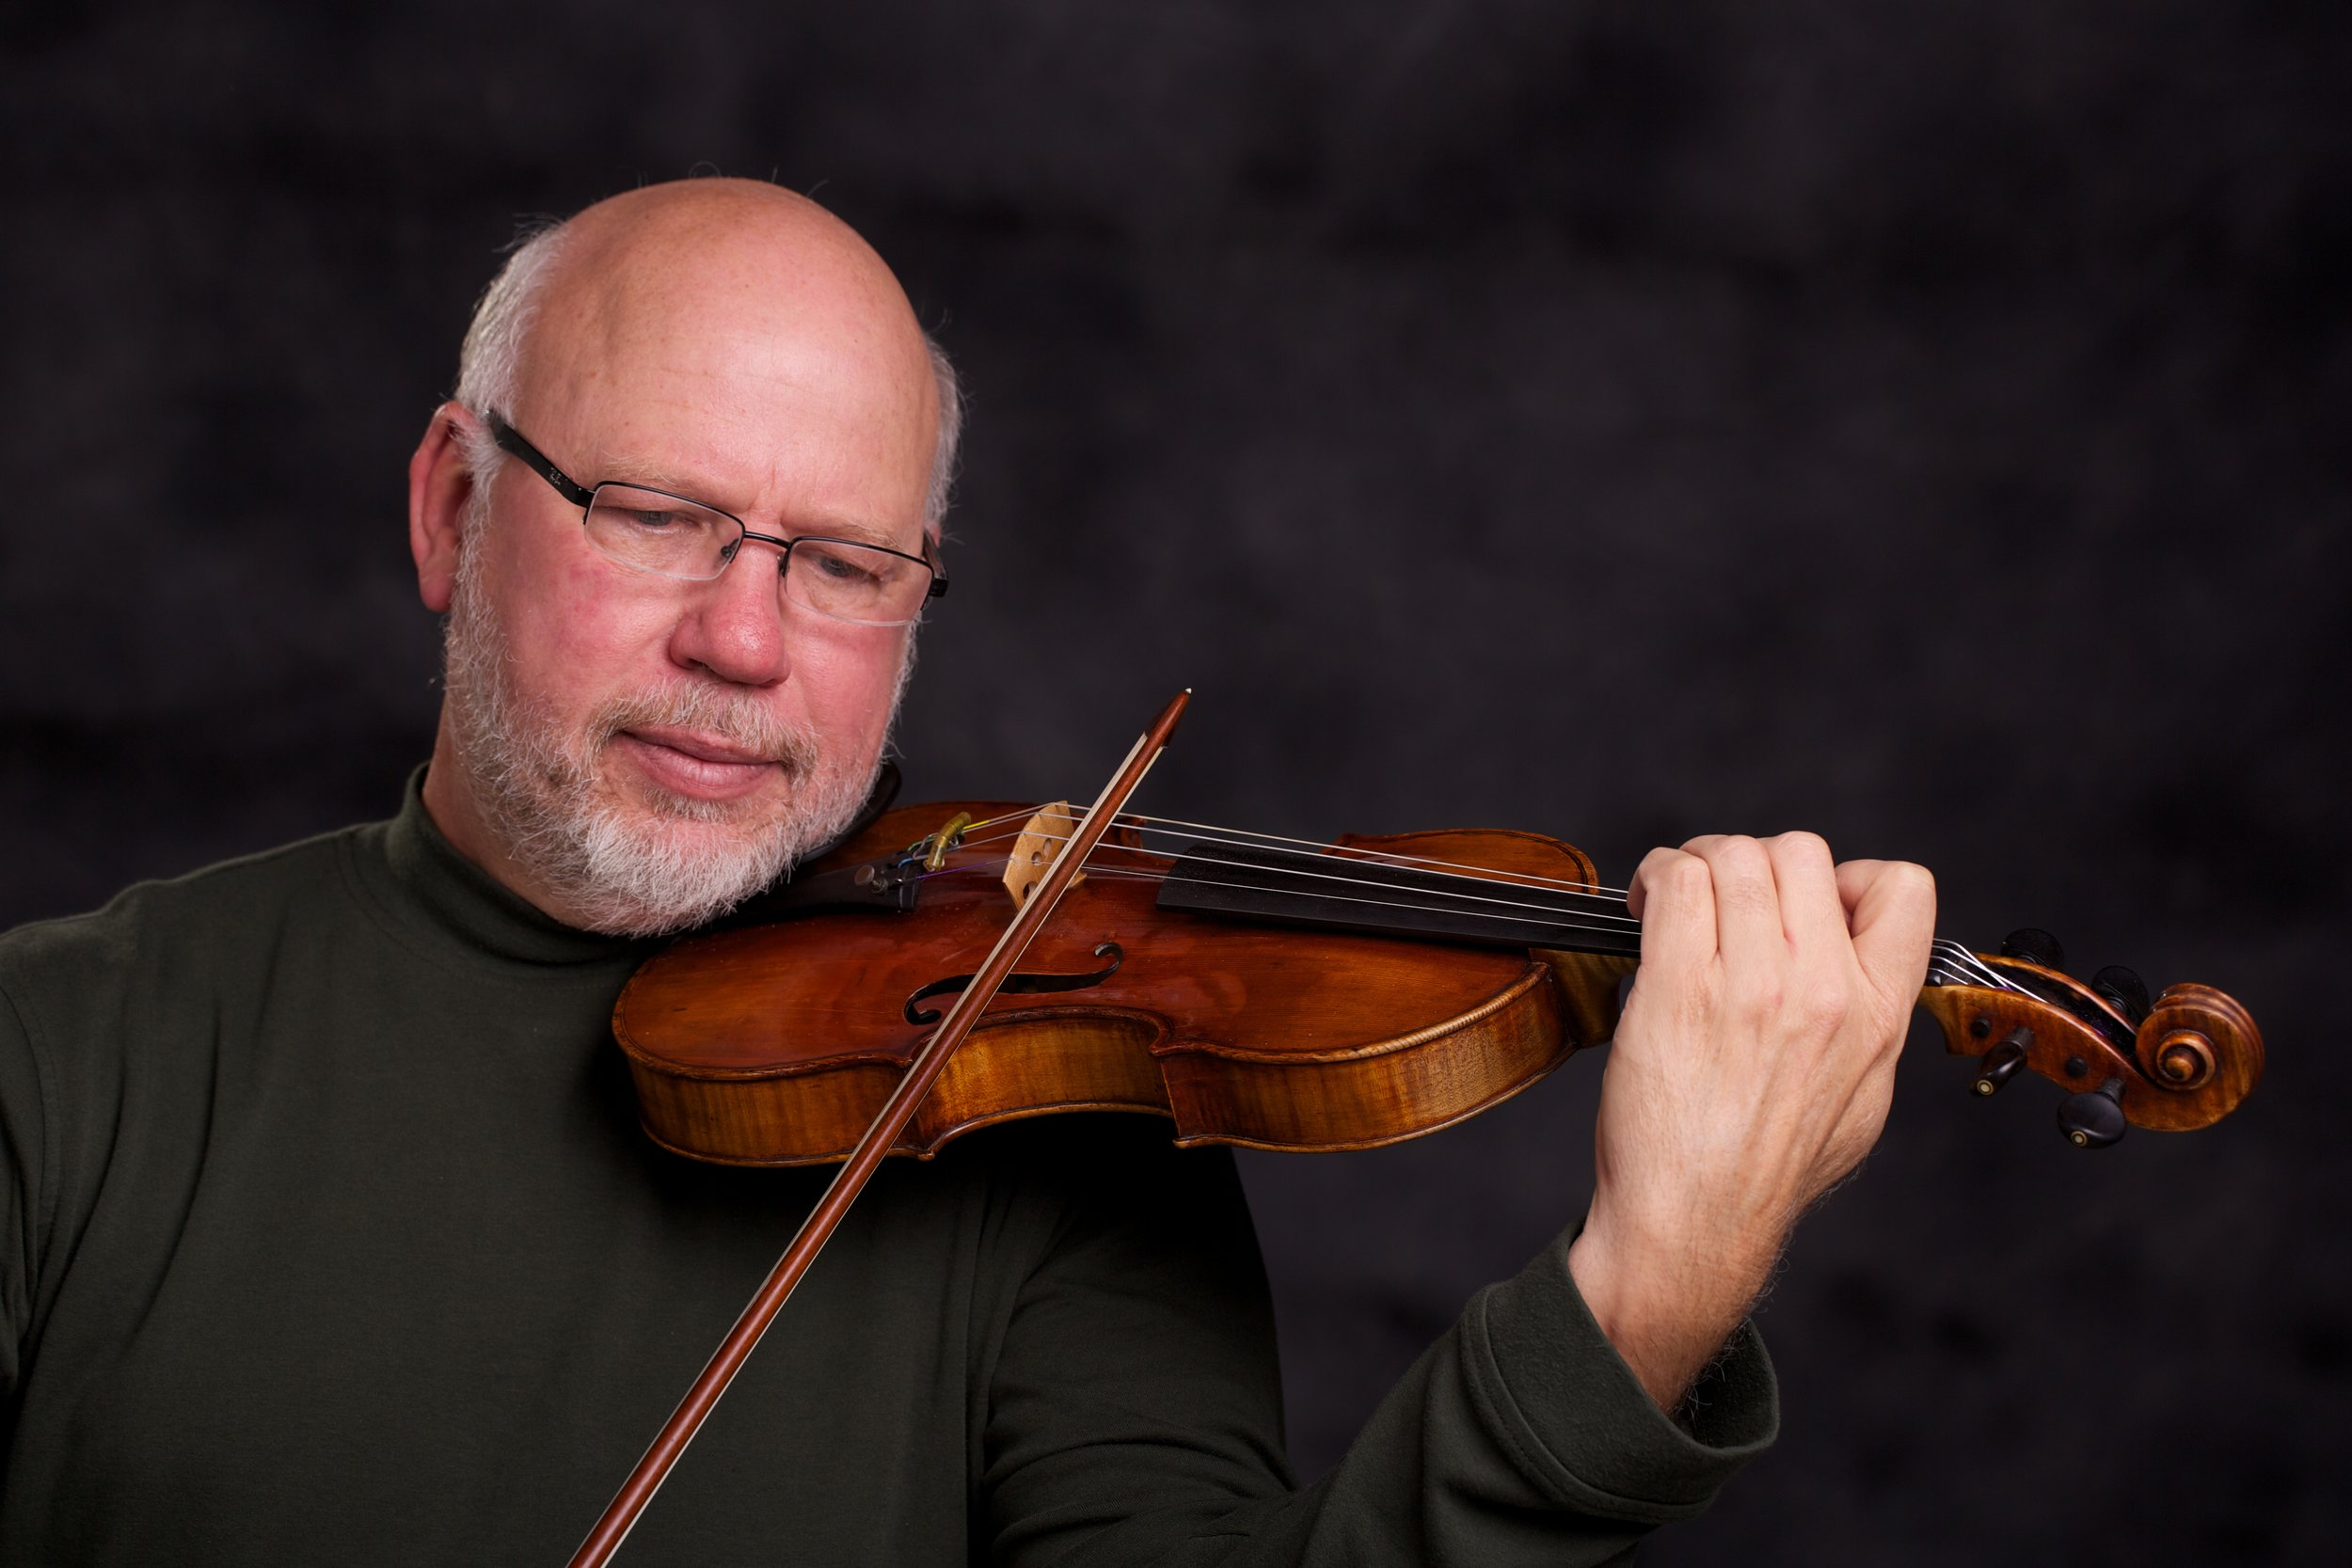 Violinist Steve Bjella